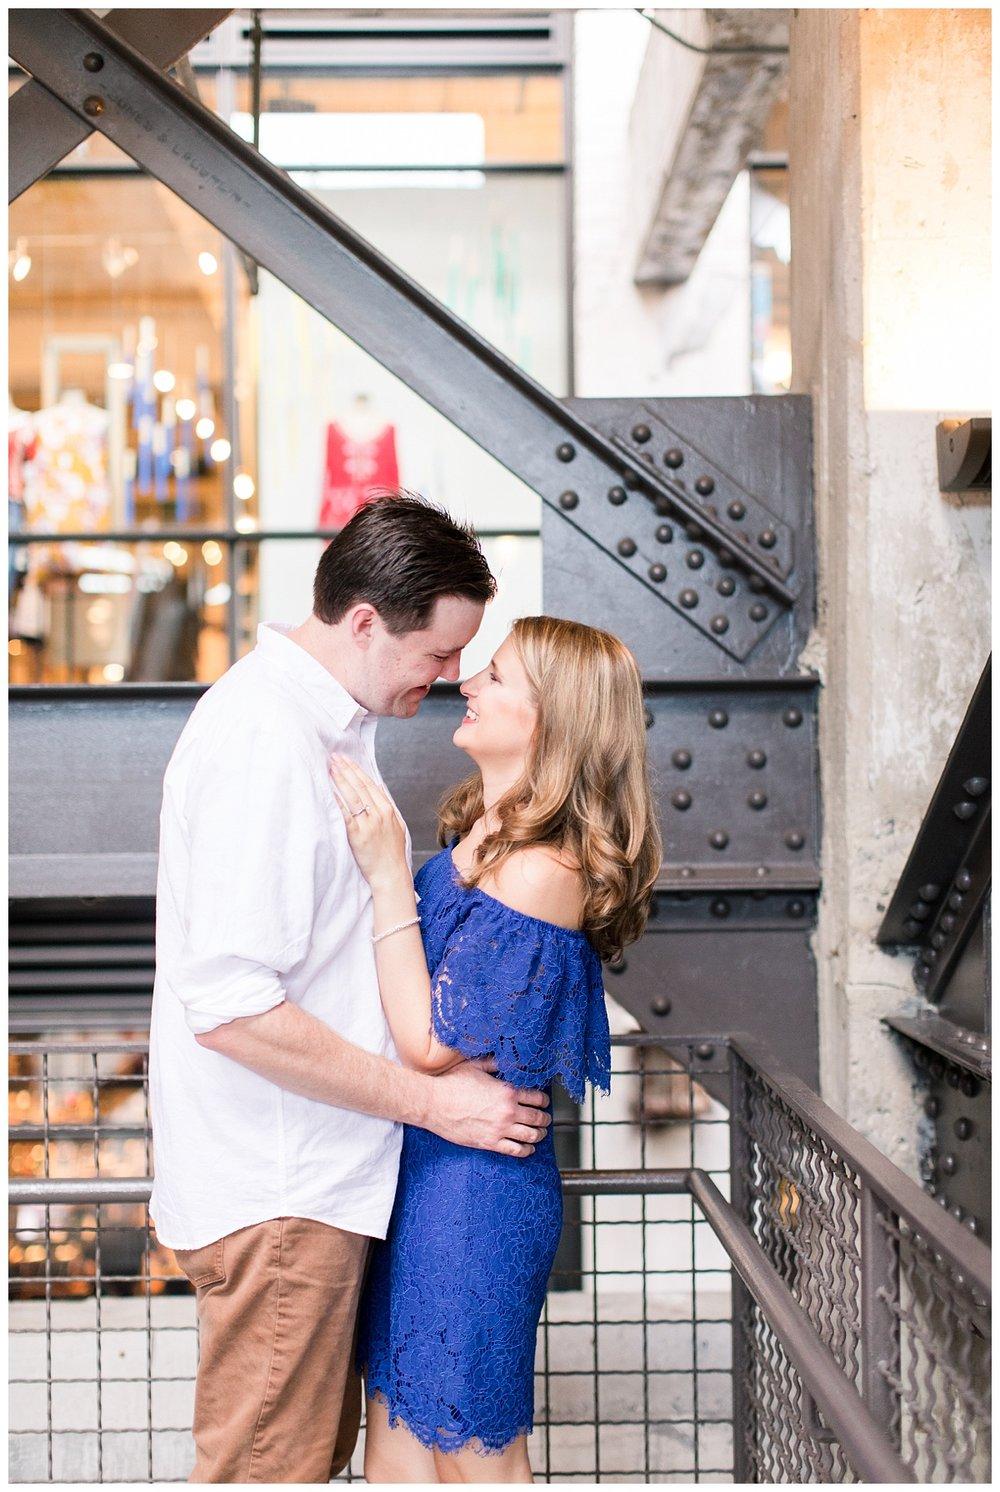 Engagement Pictures_KIm and Hamish_Abby Breaux Photography_Atlanta_Ponce City Market_Jackson Street Bridge_0009.jpg